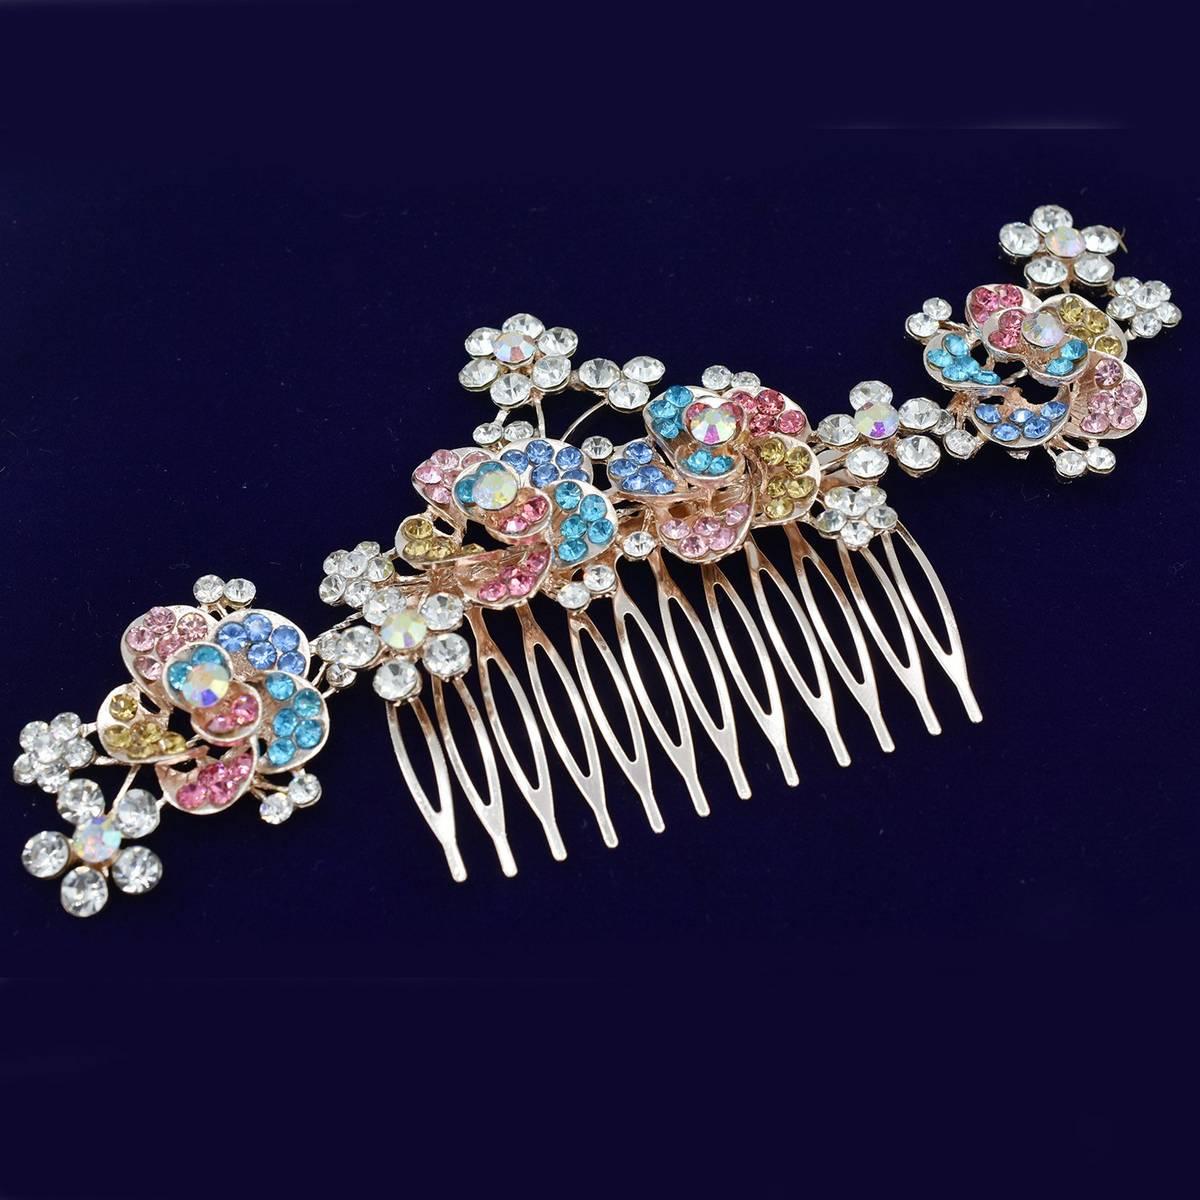 Pearl Bridal Hair Clip Accessories Jewelry Wedding Elegant Crystal Bride Hair Comb Headwear